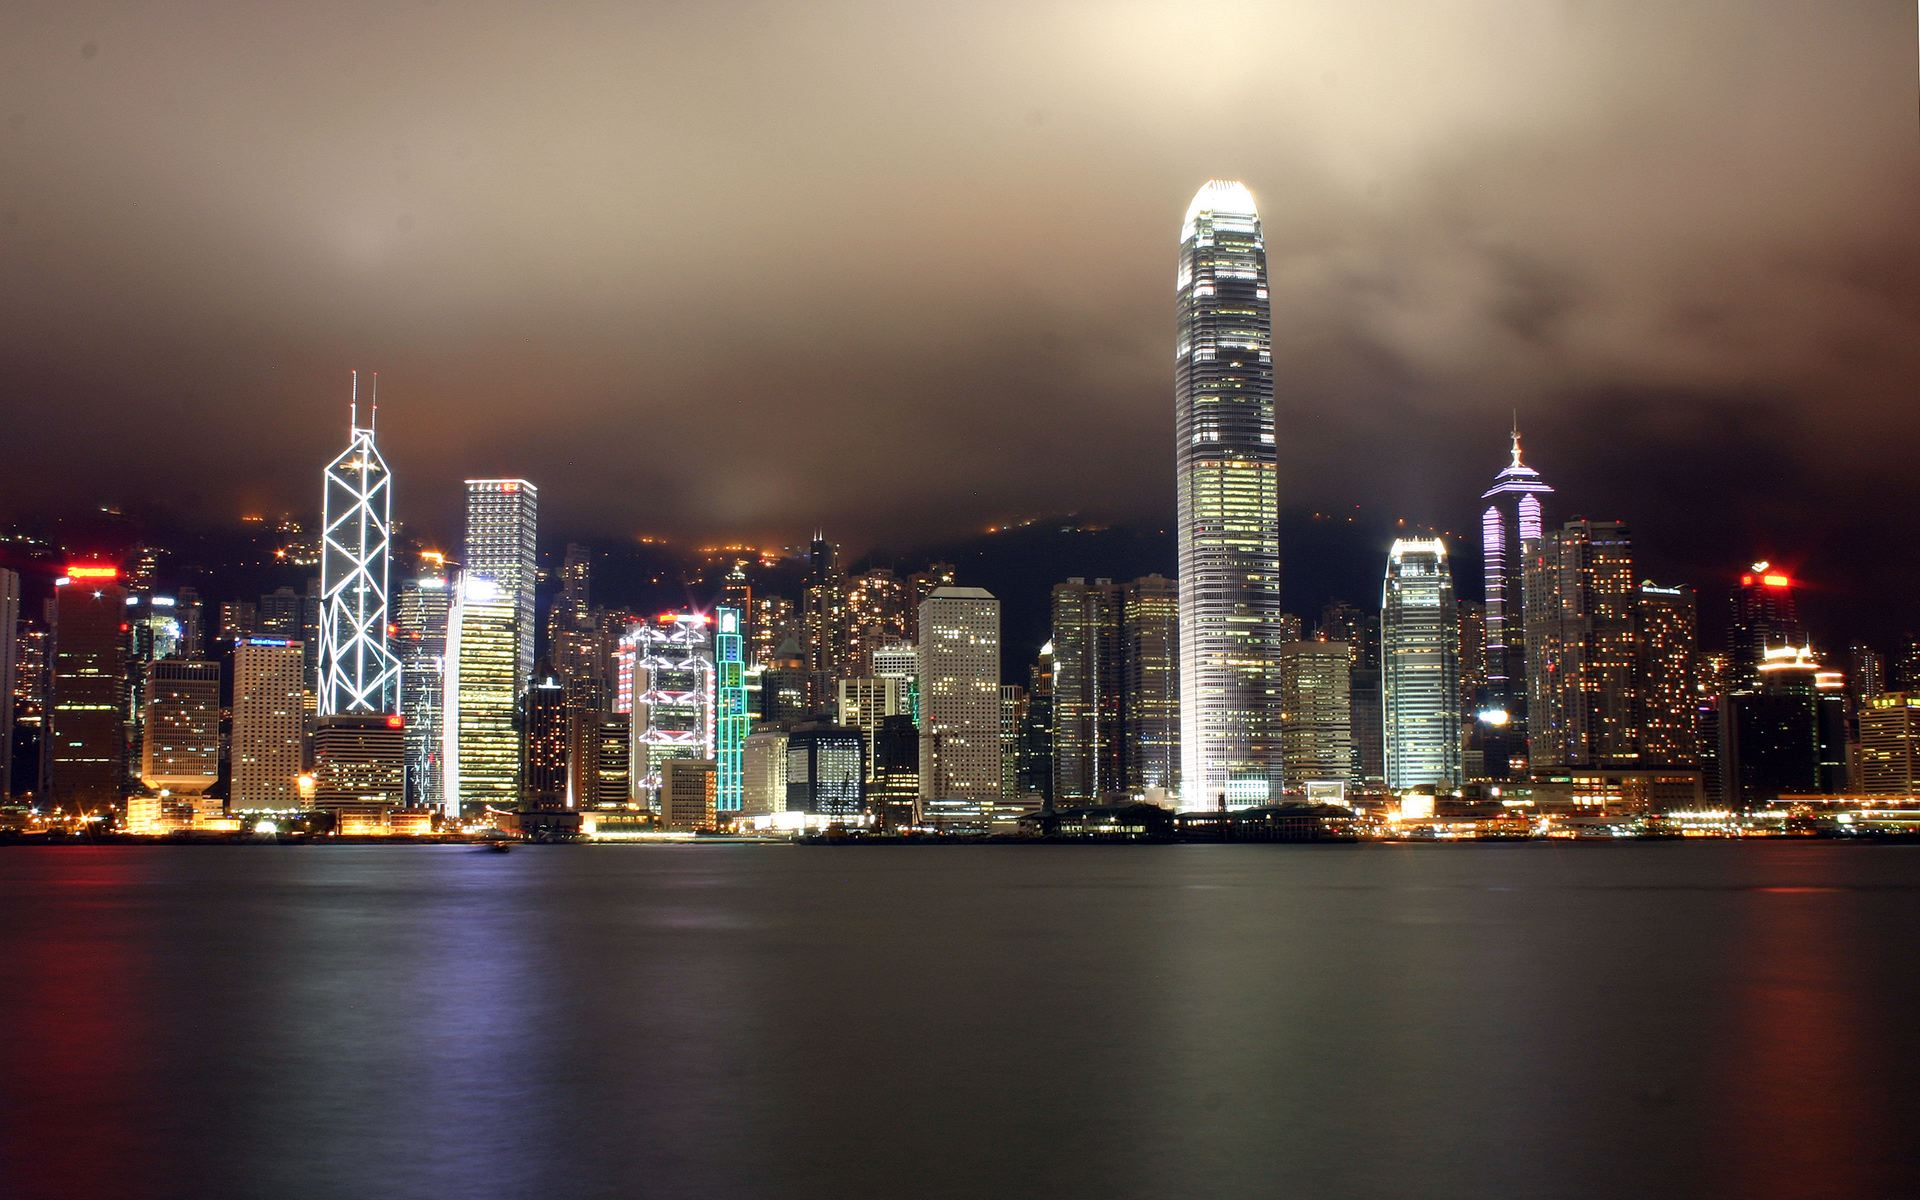 http://danutzayy.files.wordpress.com/2010/04/night-city-lights-wallpapers-pack-3-06.jpg